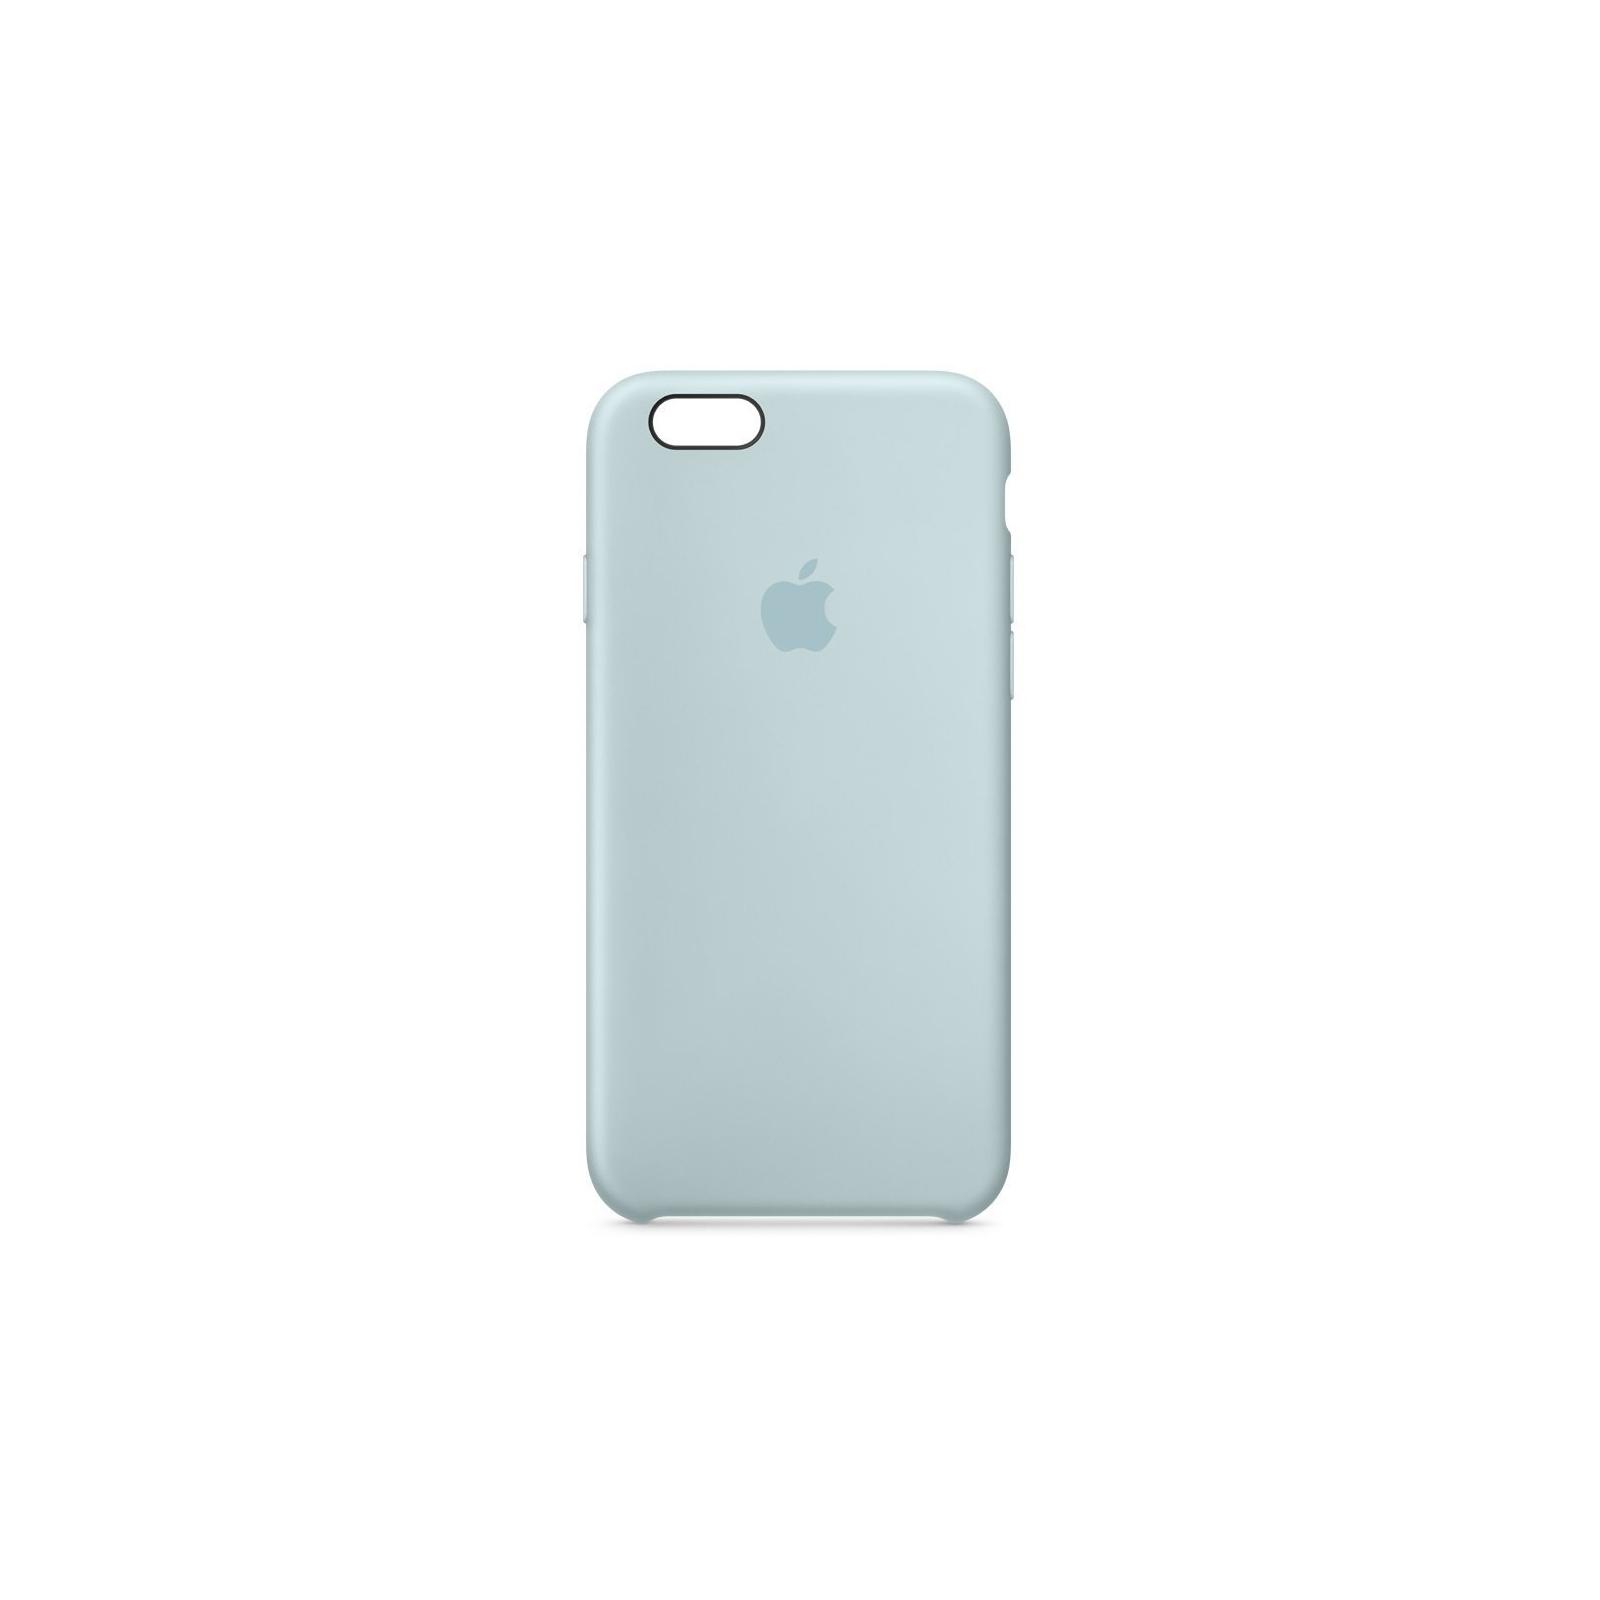 Чехол для моб. телефона Apple для iPhone 6/6s Torquoise (MLCW2ZM/A)